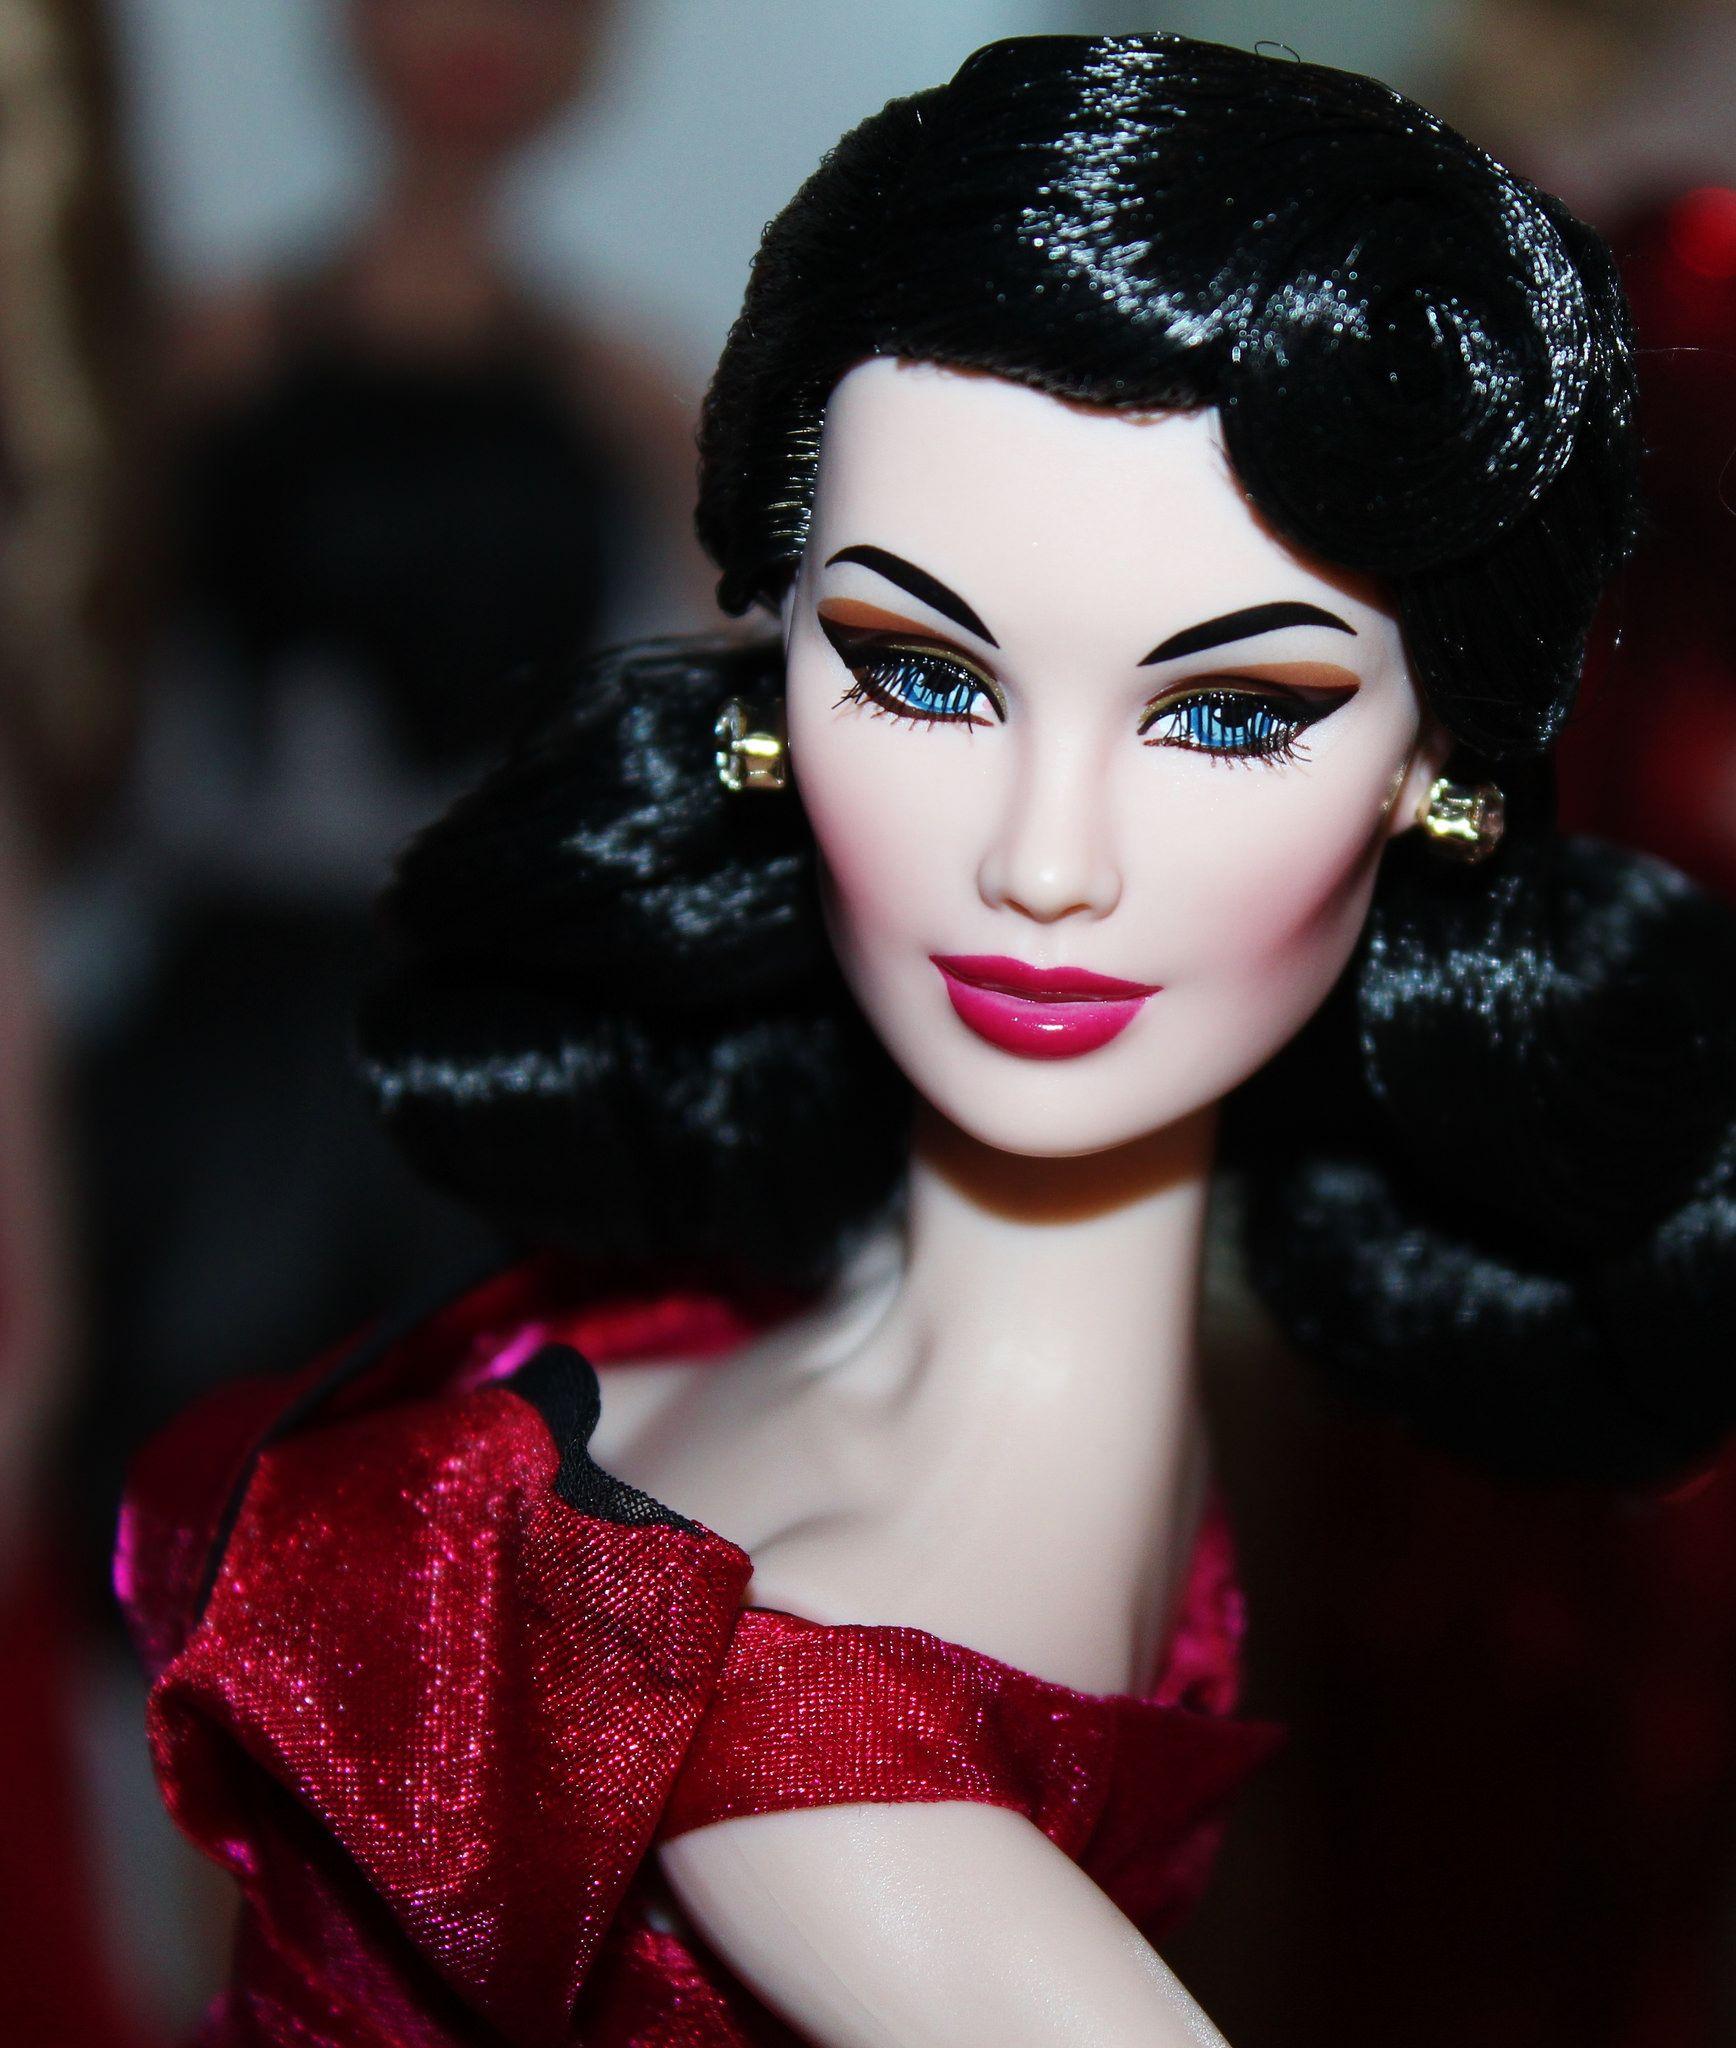 2015 Katy Keene Gift Set Gifts, Fashion dolls, Doll face